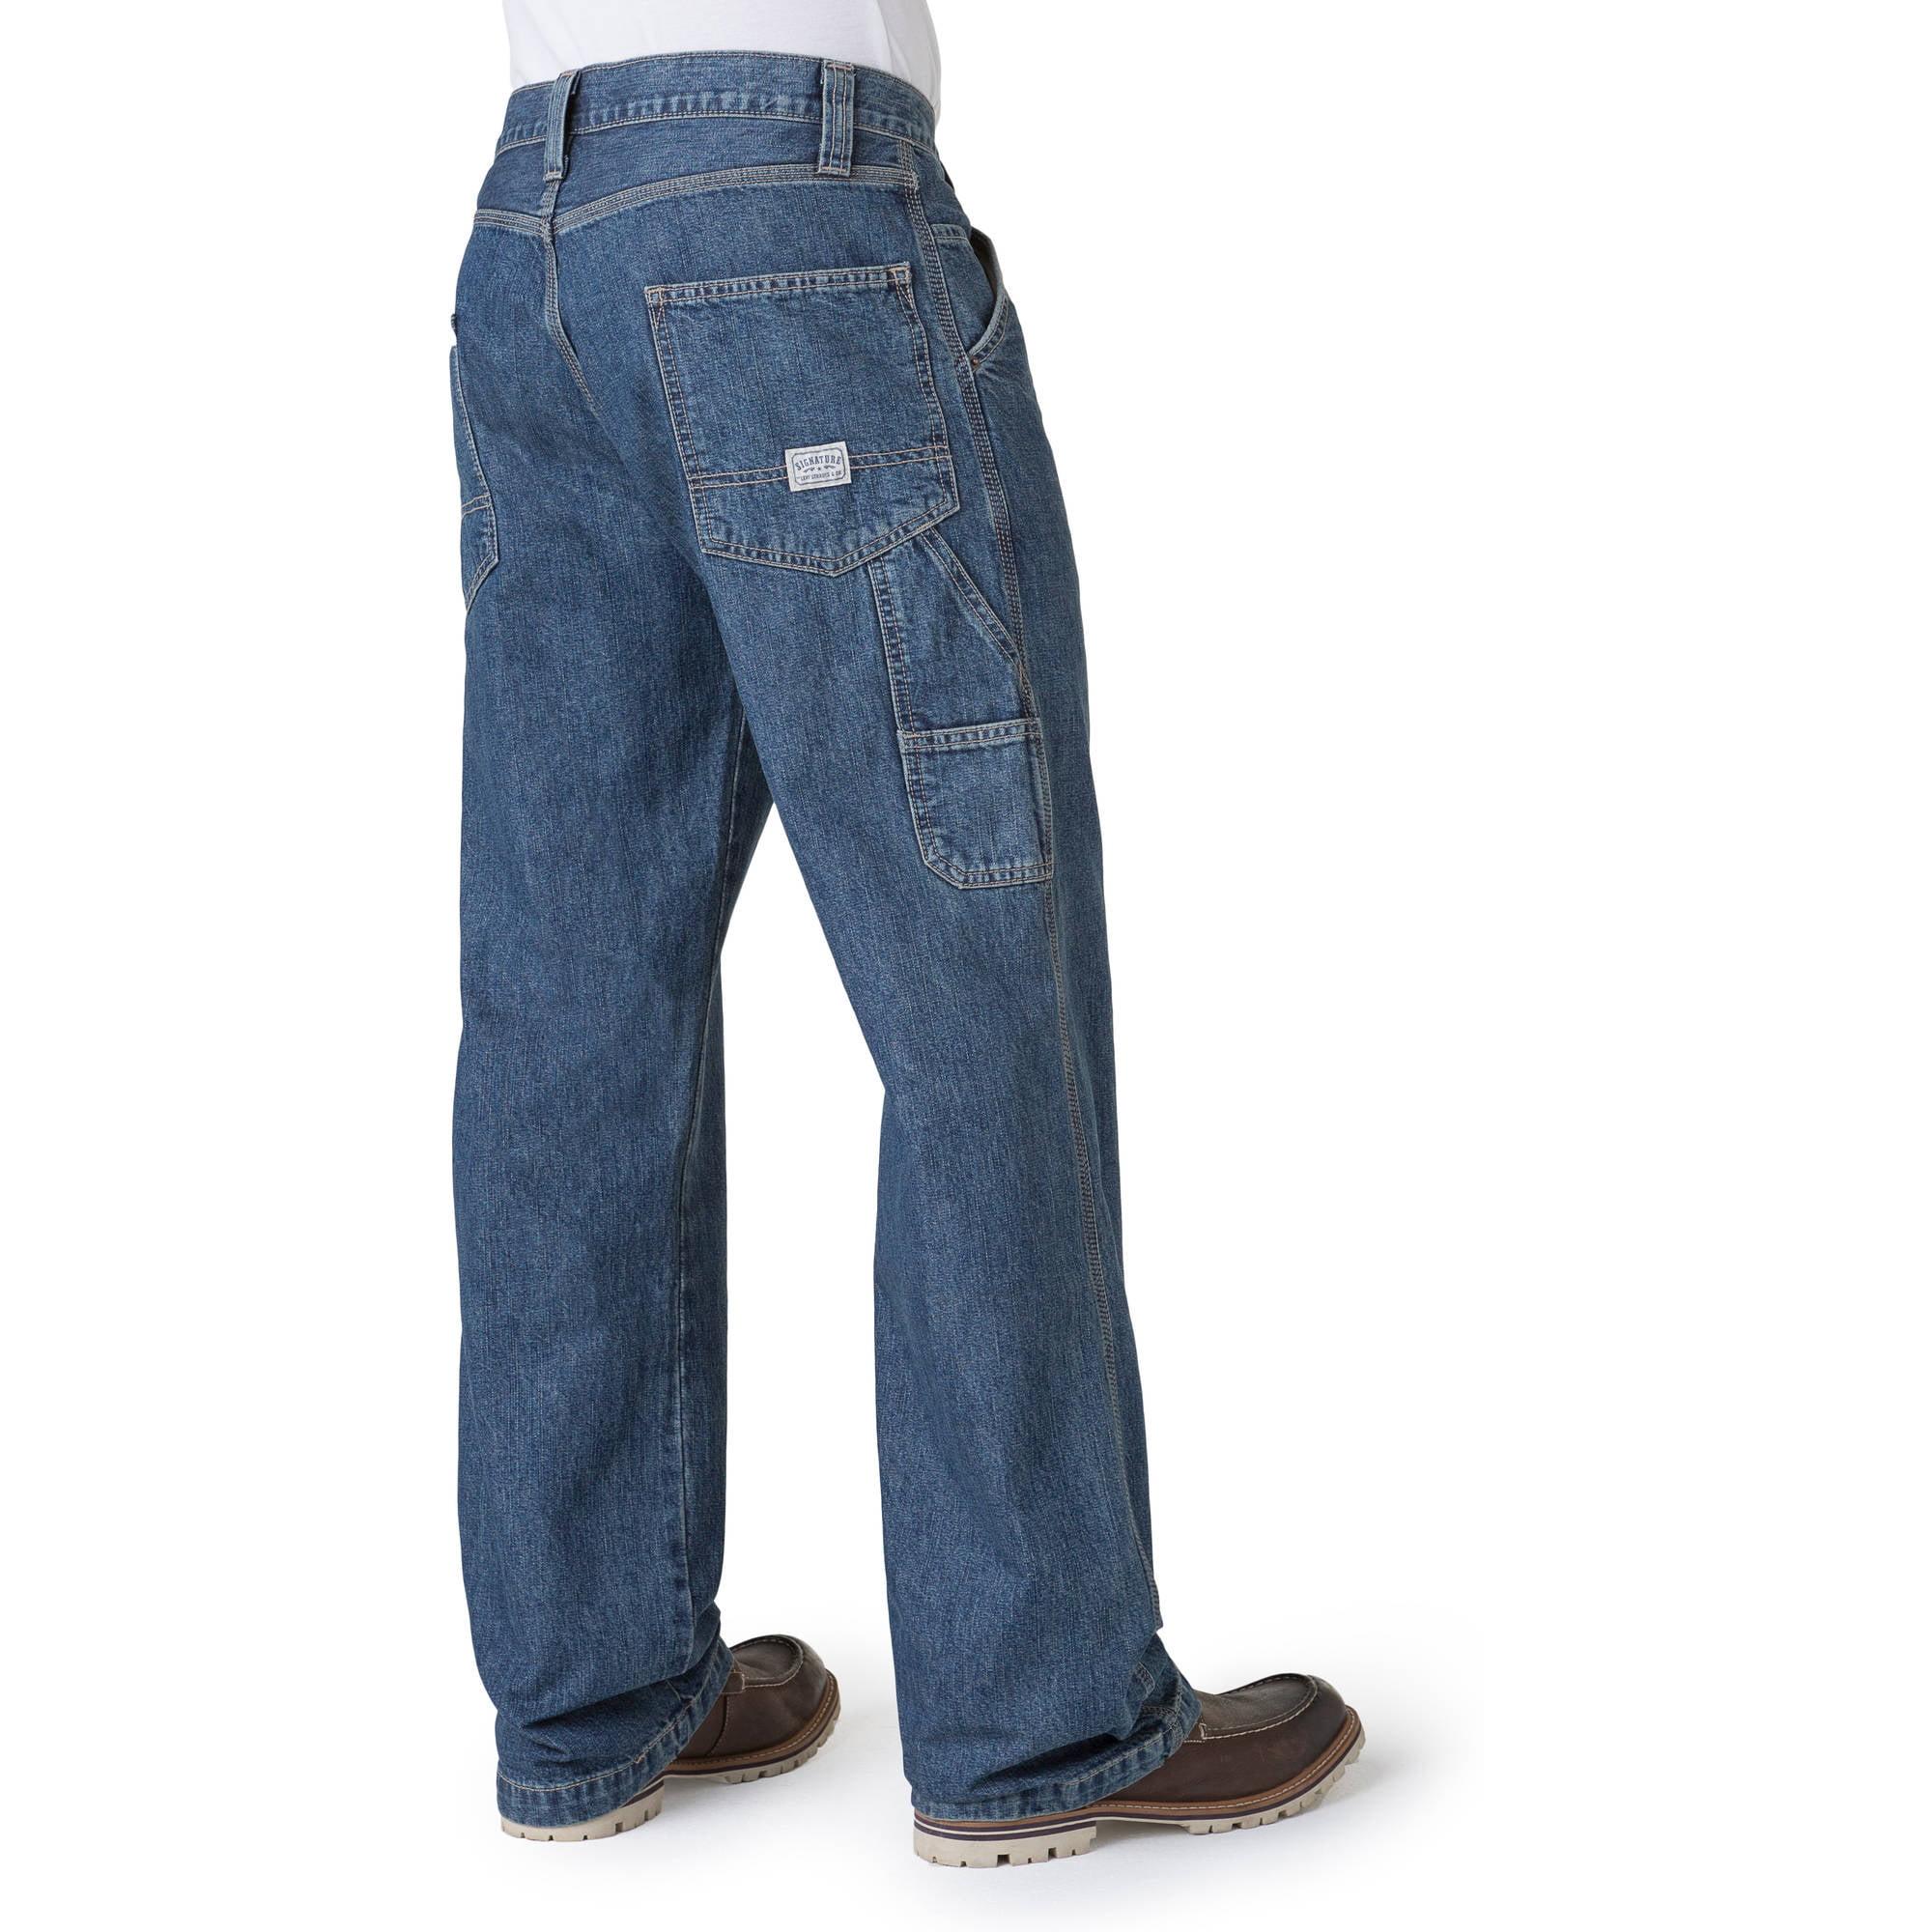 Signature by Levi Strauss & Co. Men's Carpenter Jeans - Walmart.com